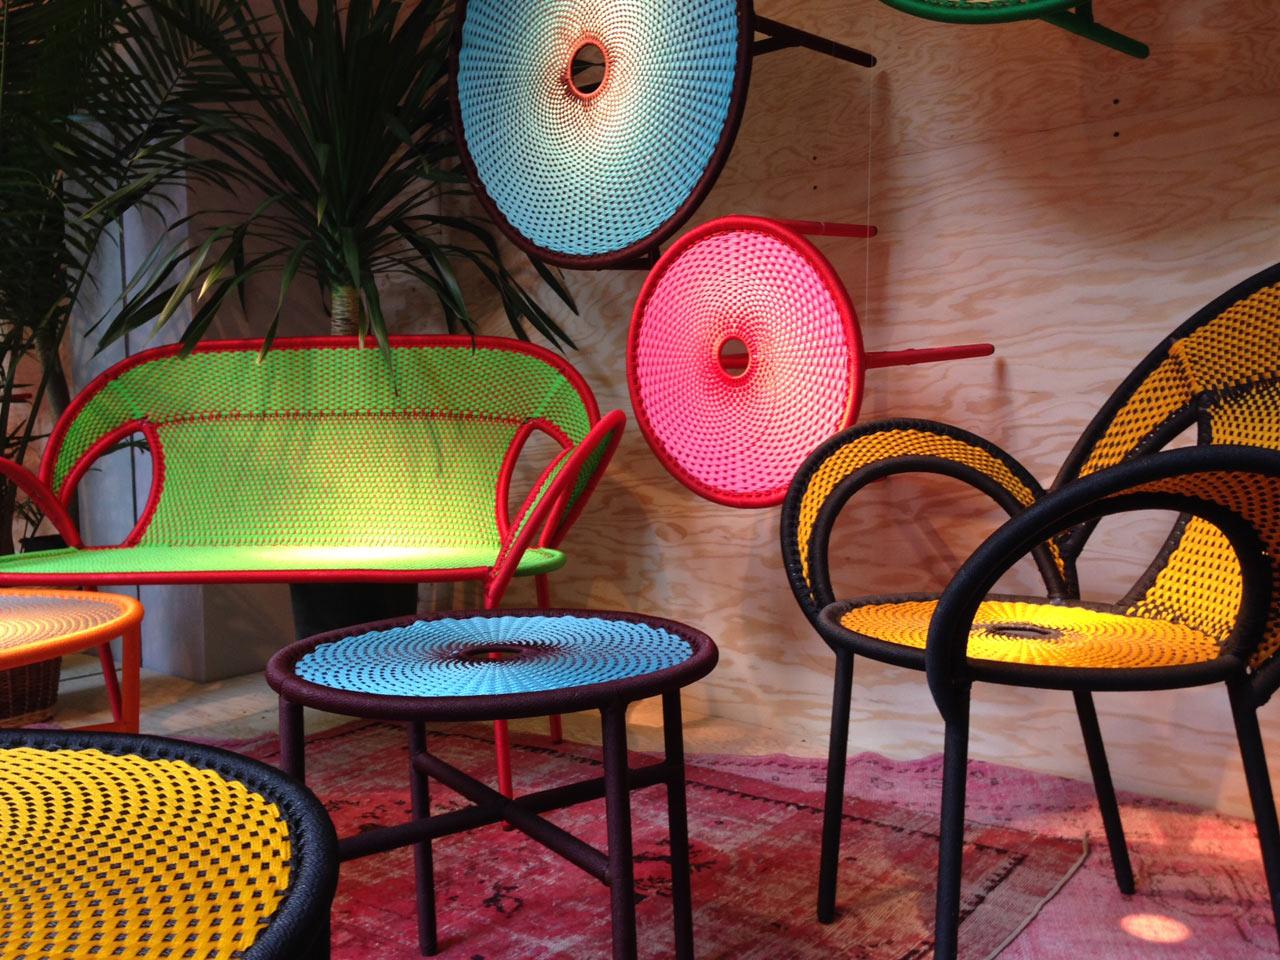 Moroso-Sebastian-Herkner-Banjooli-seating-1